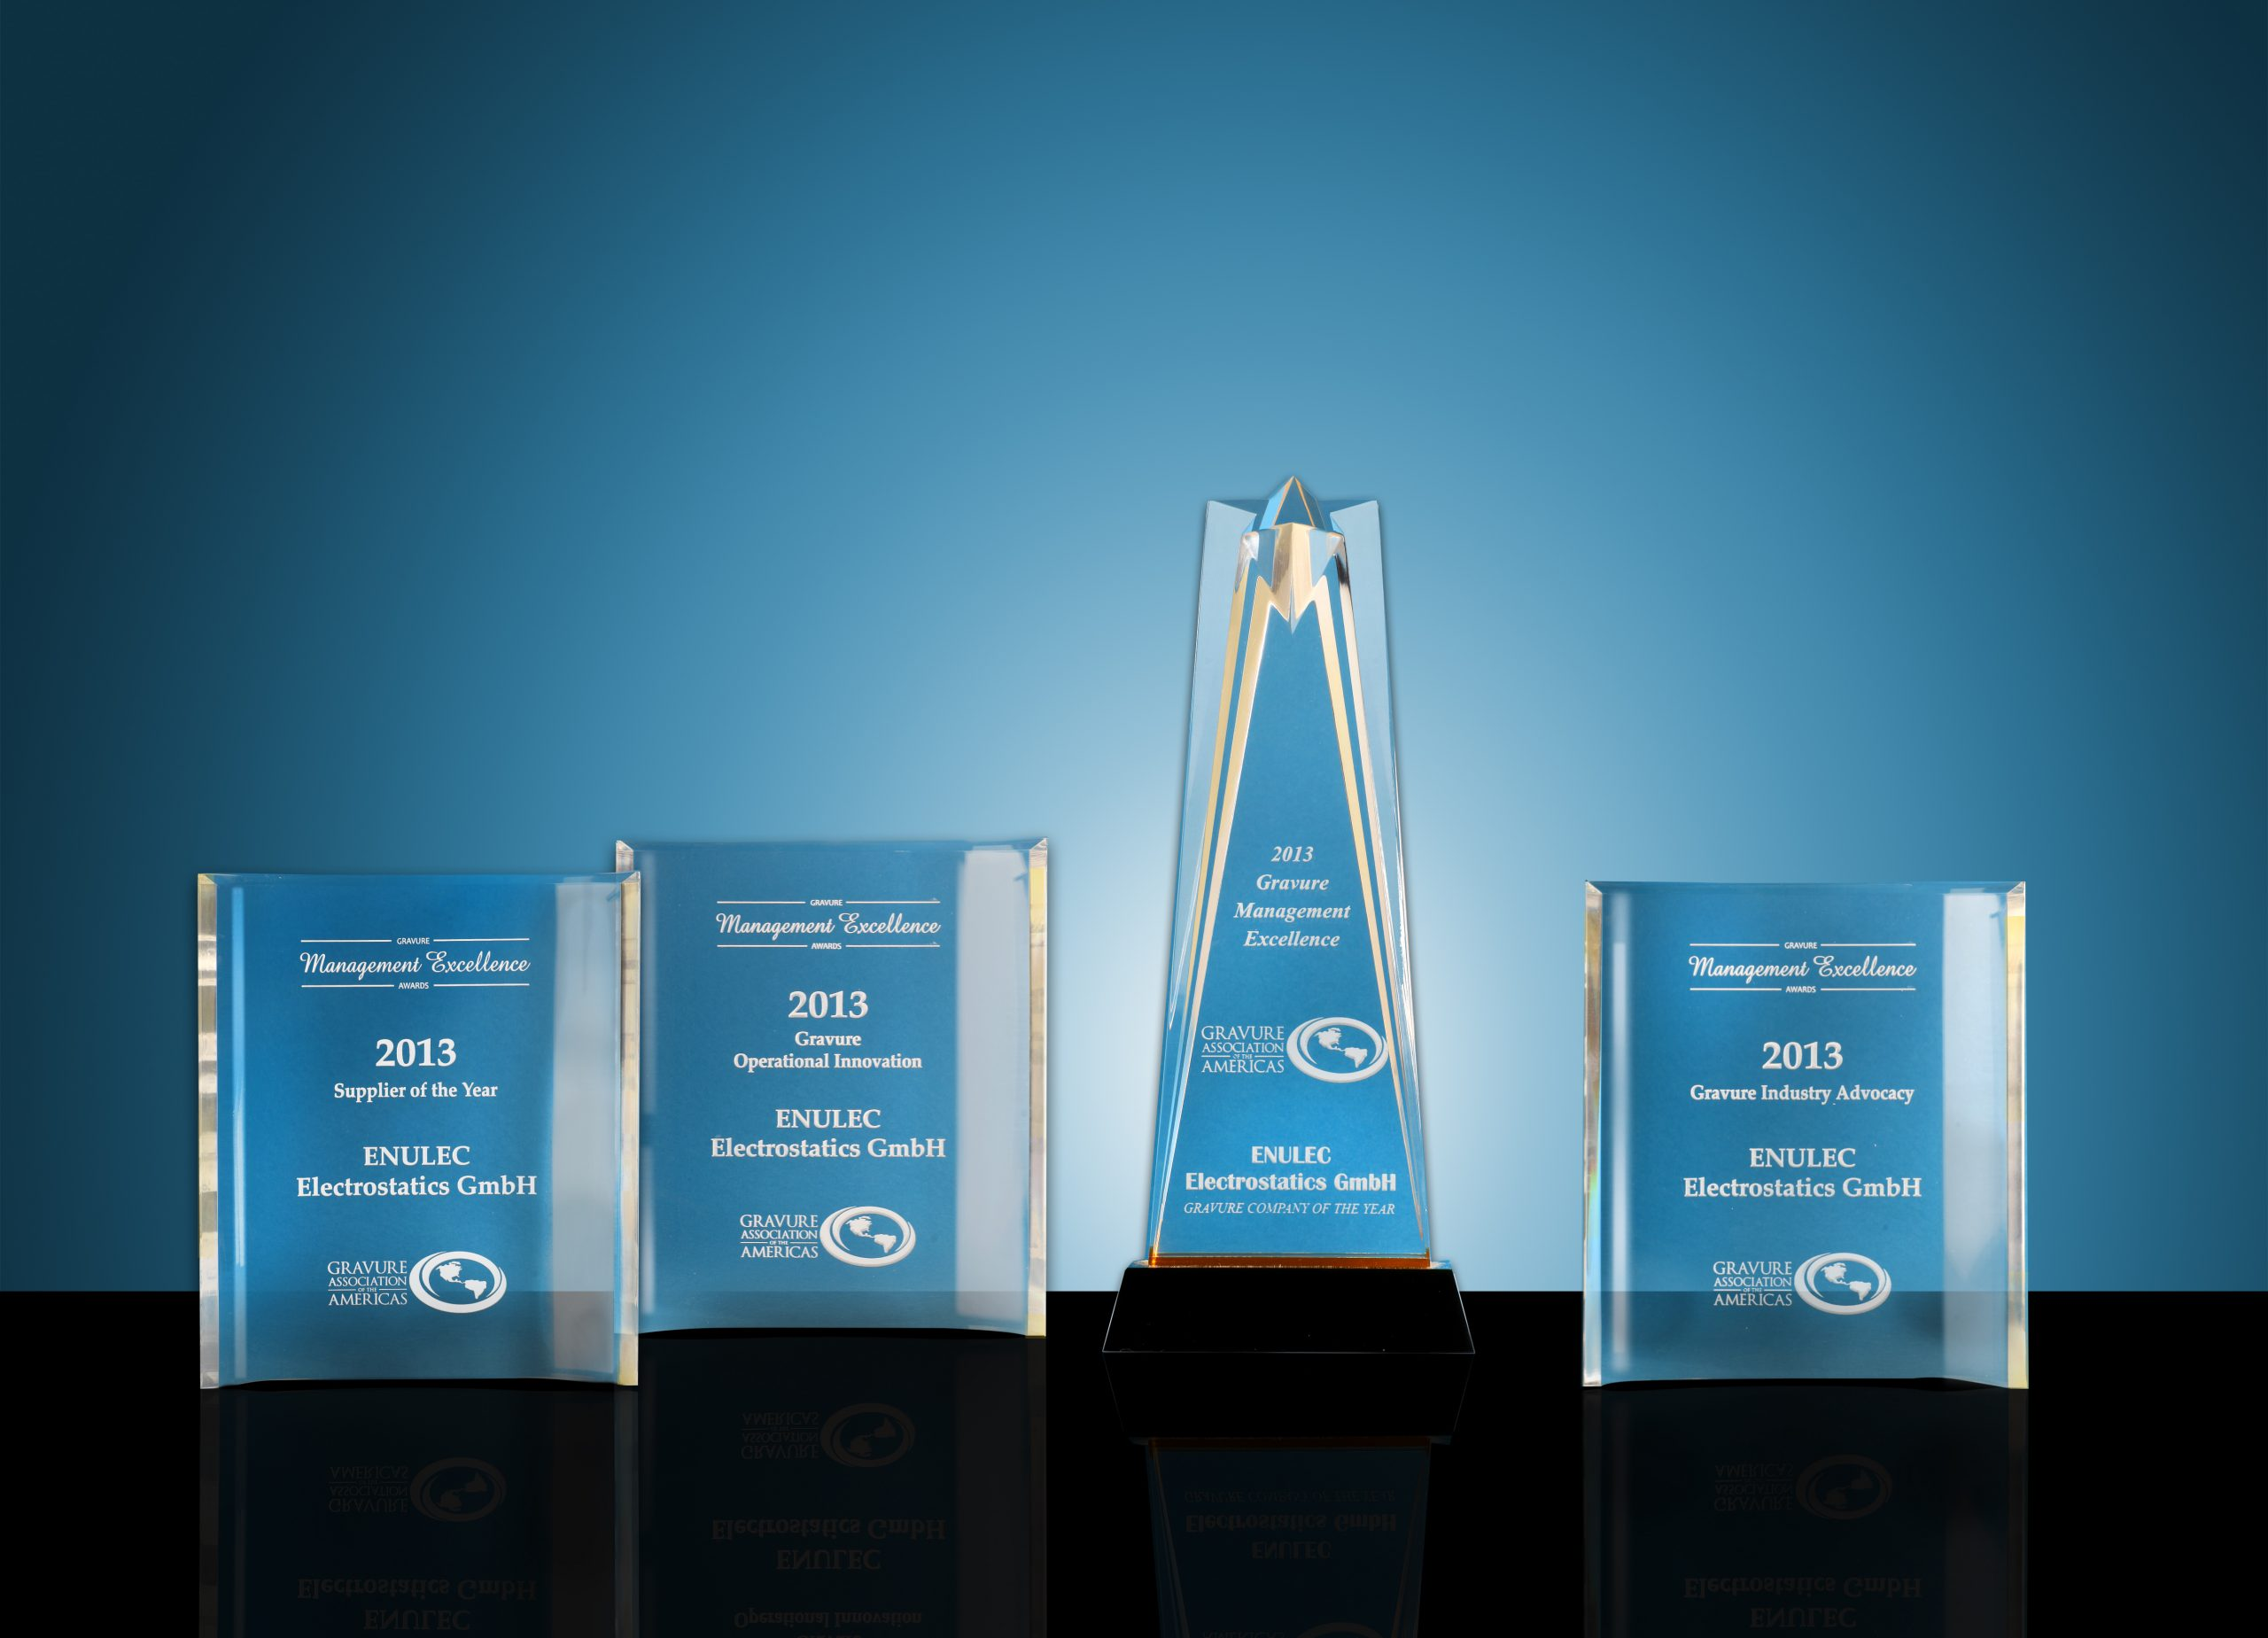 ENULC was awarded